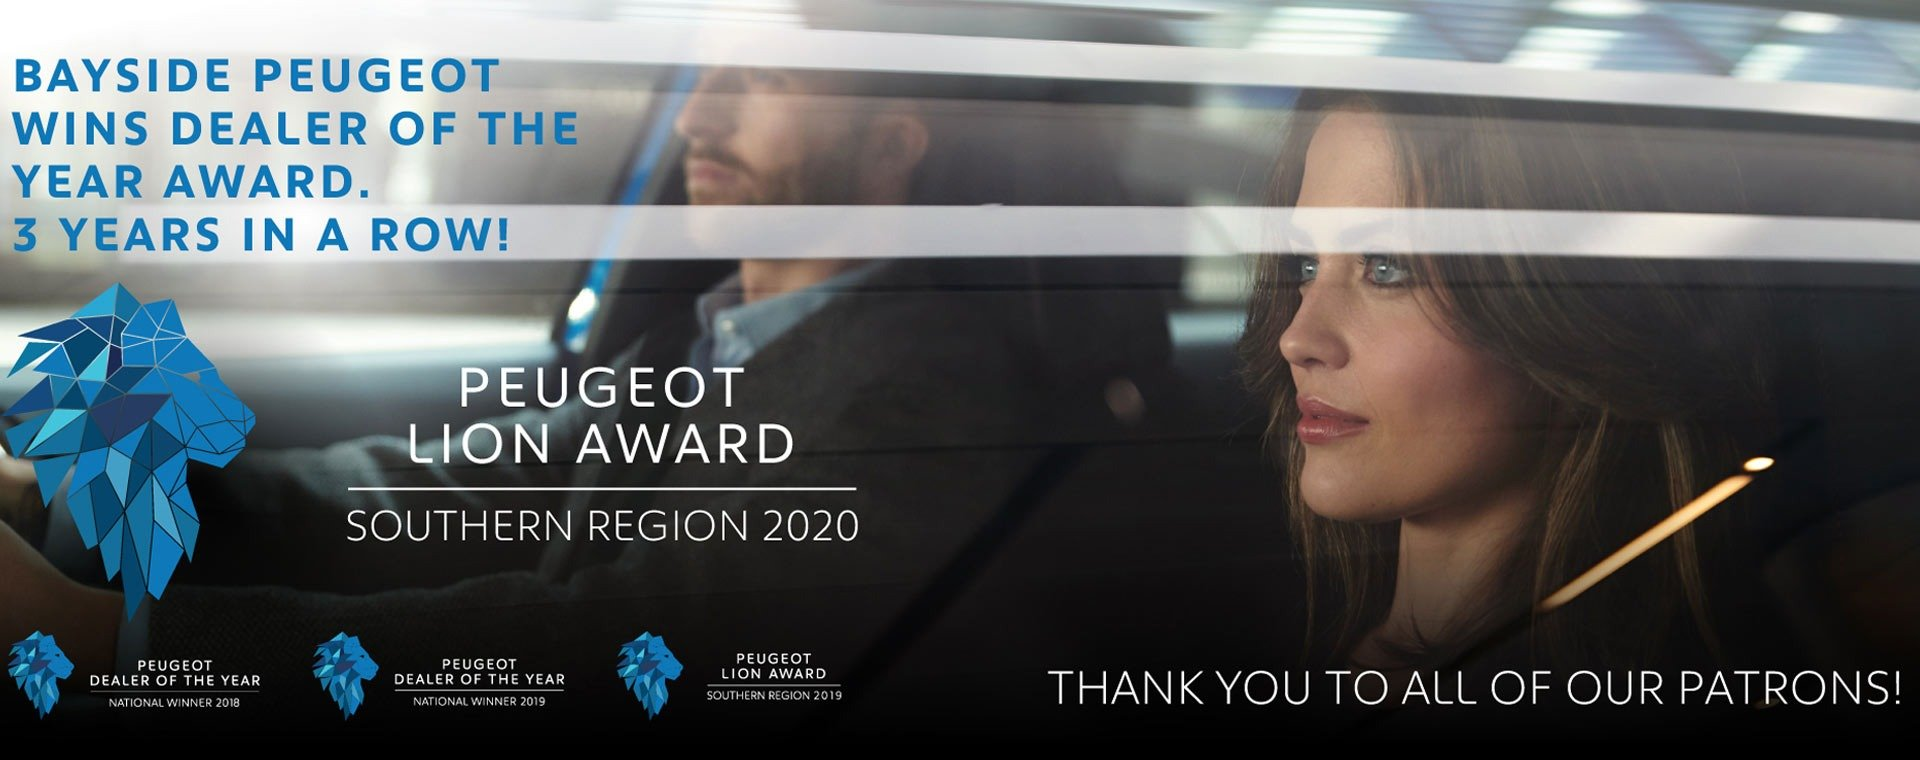 Bayside-Peugeot-Reward